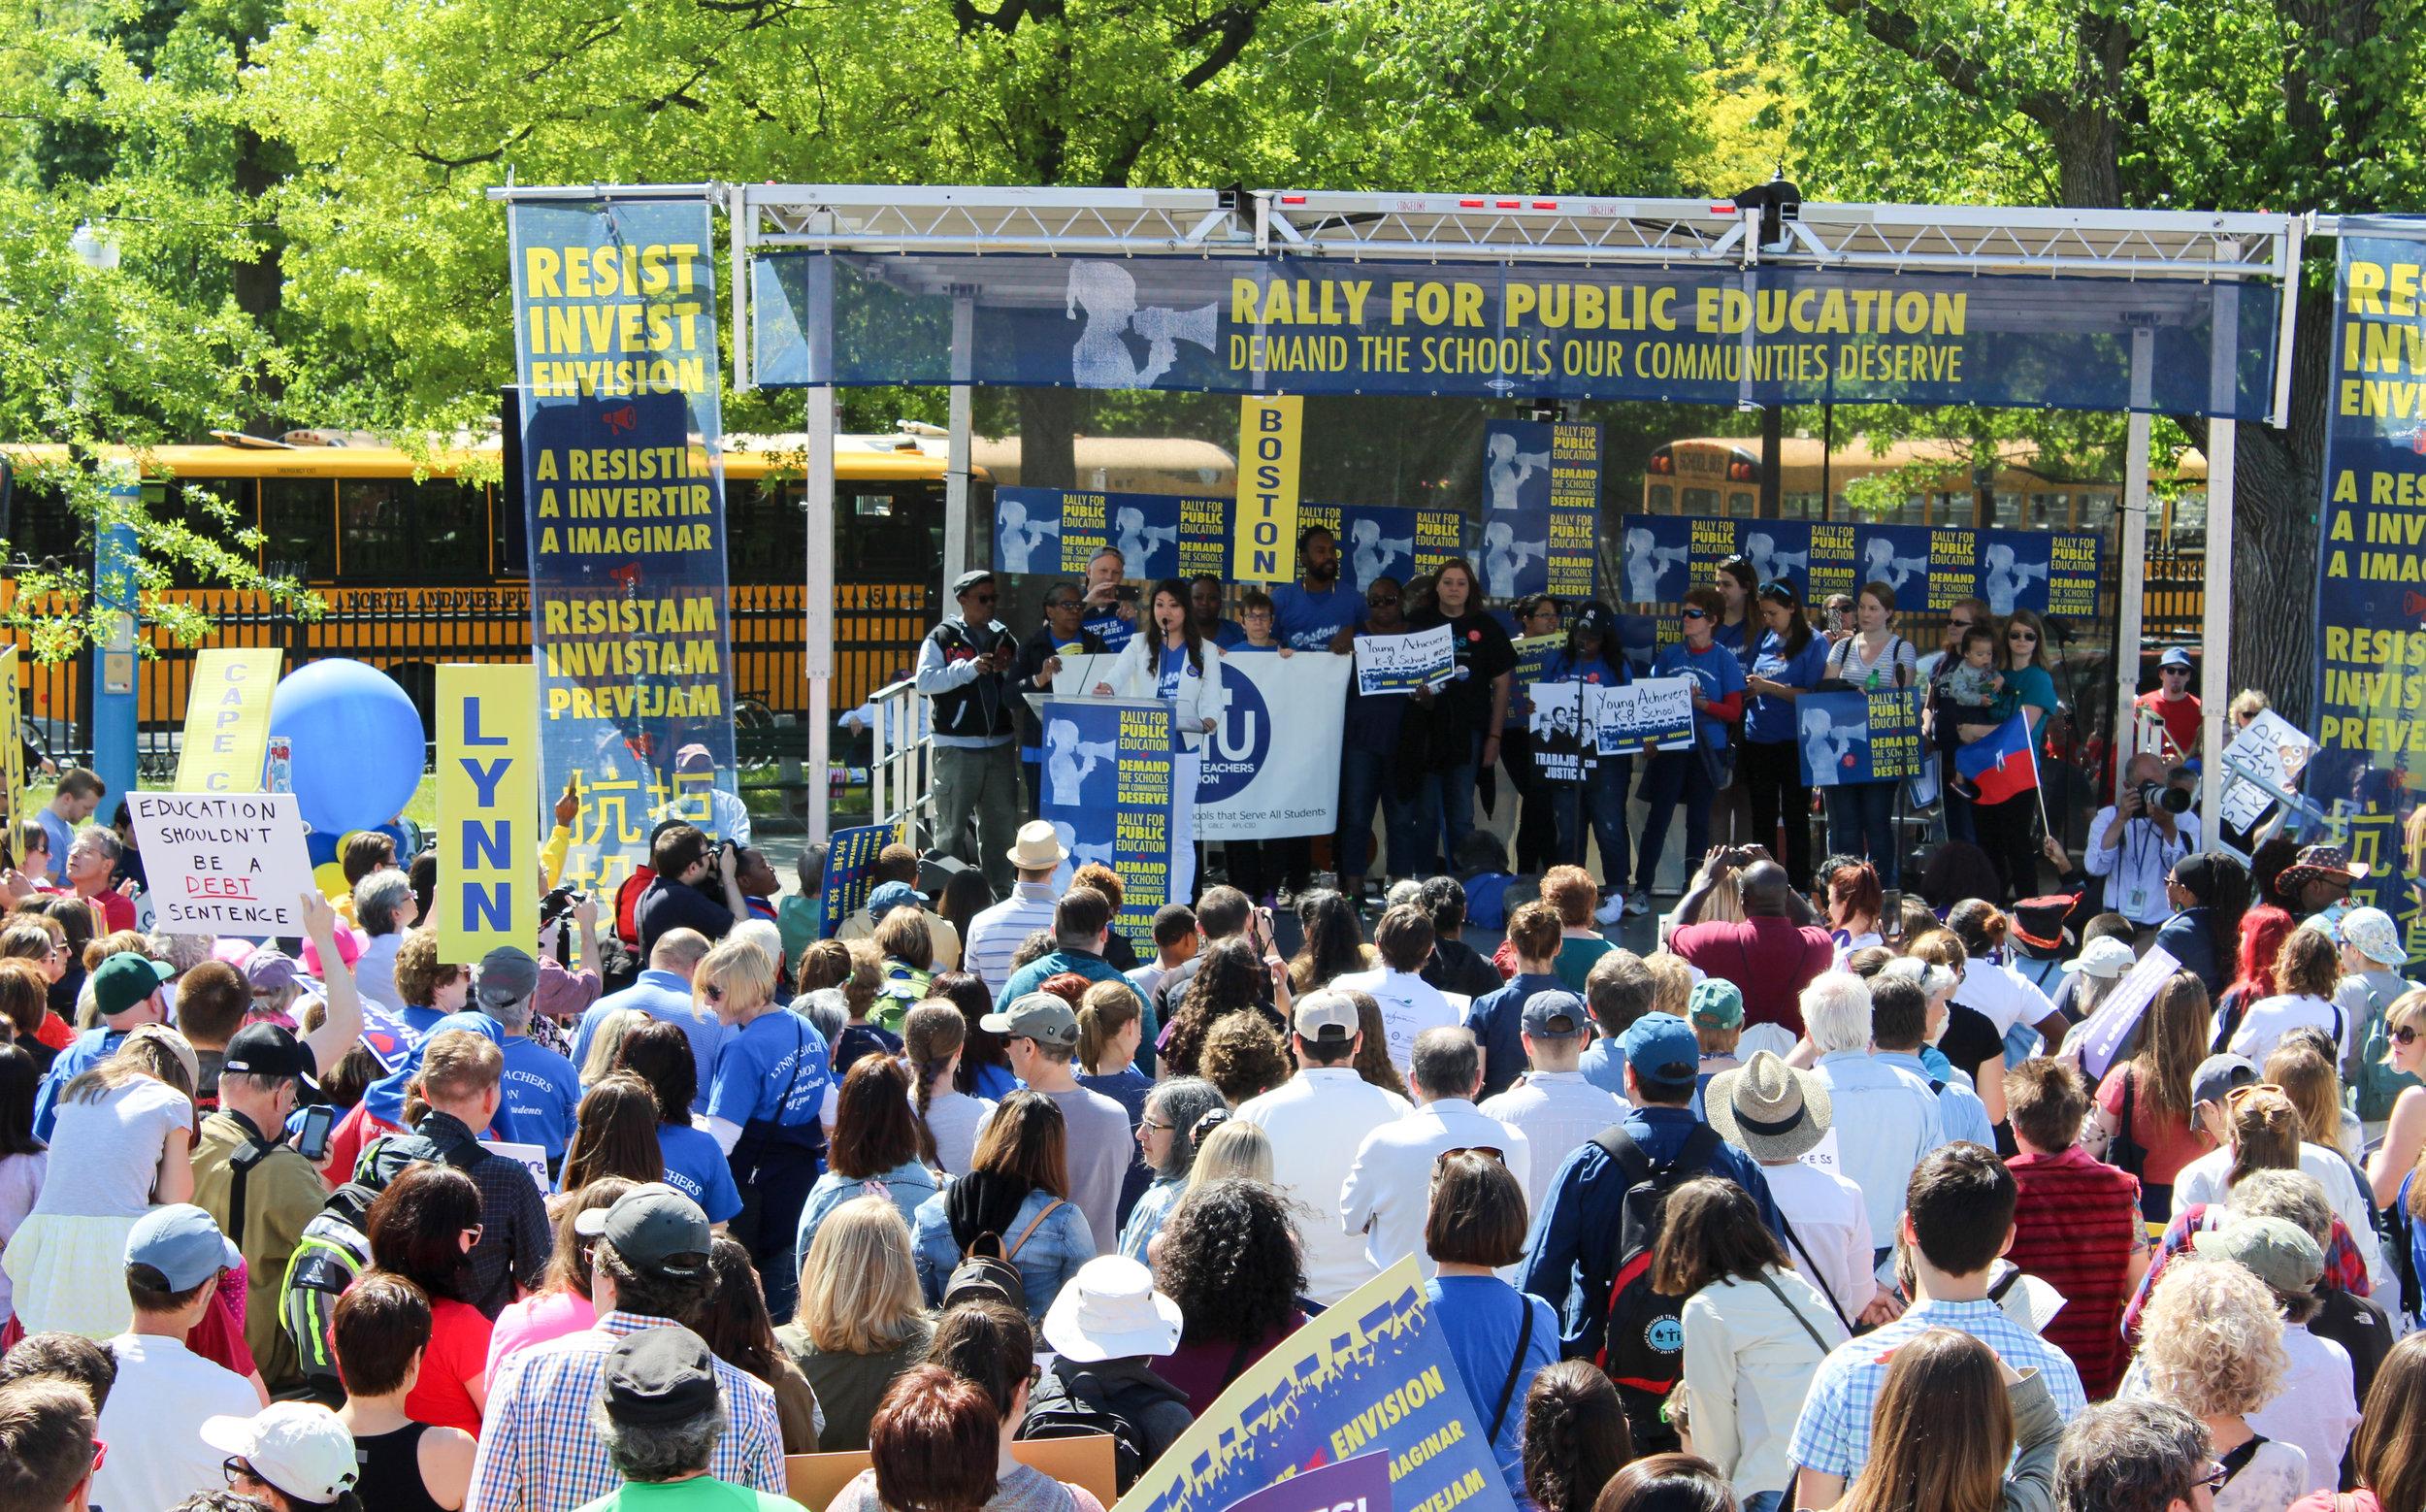 Jessica Tang, president-elect of the Boston Teachers Union, speaks to the crowd. (Zac Bears/PHENOM)